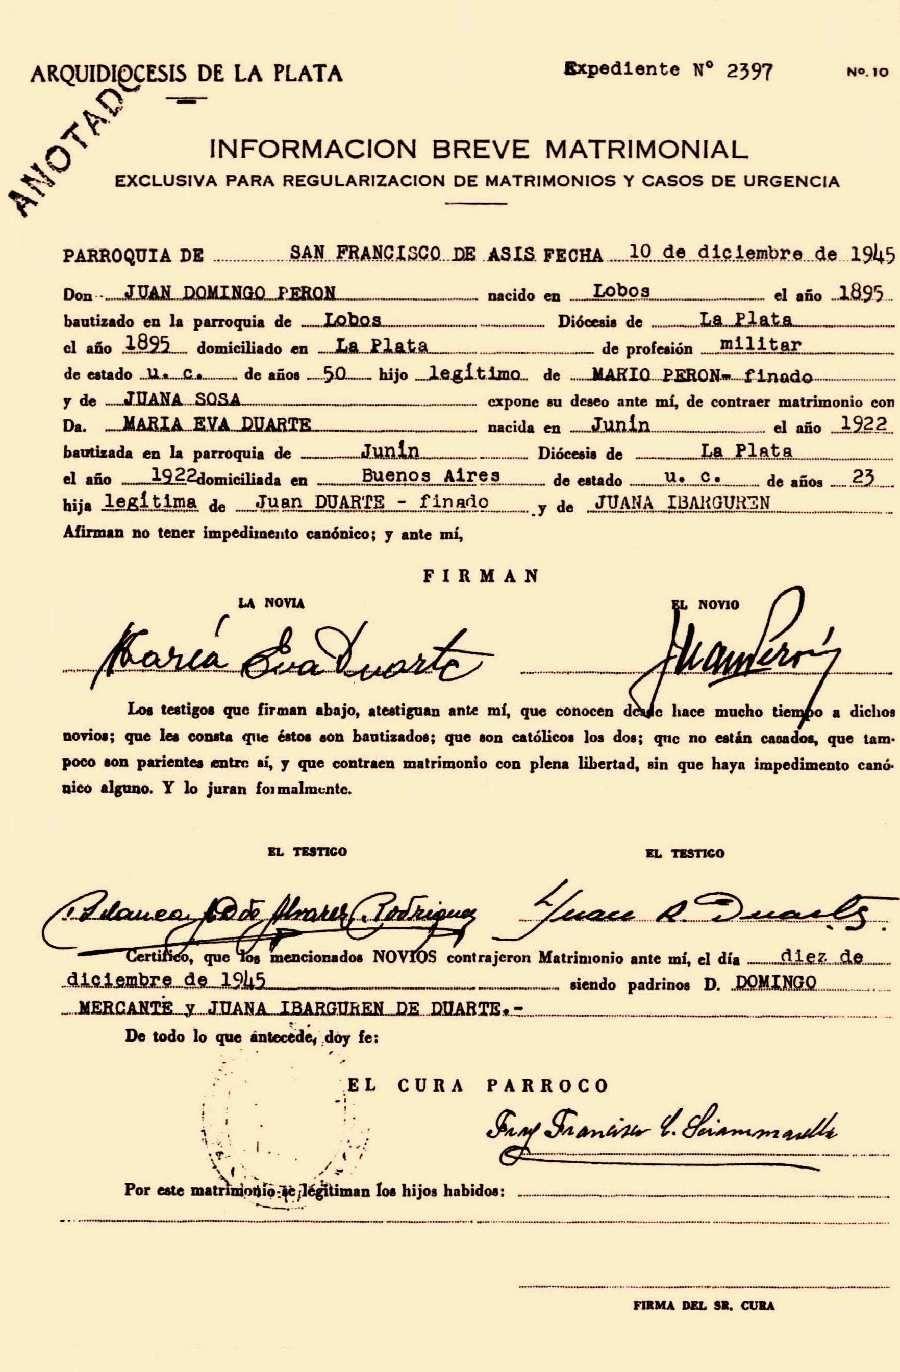 Matrimonio Catolico Sin Confirmacion : Acta de matrimonio religioso perón y eva duarte en la